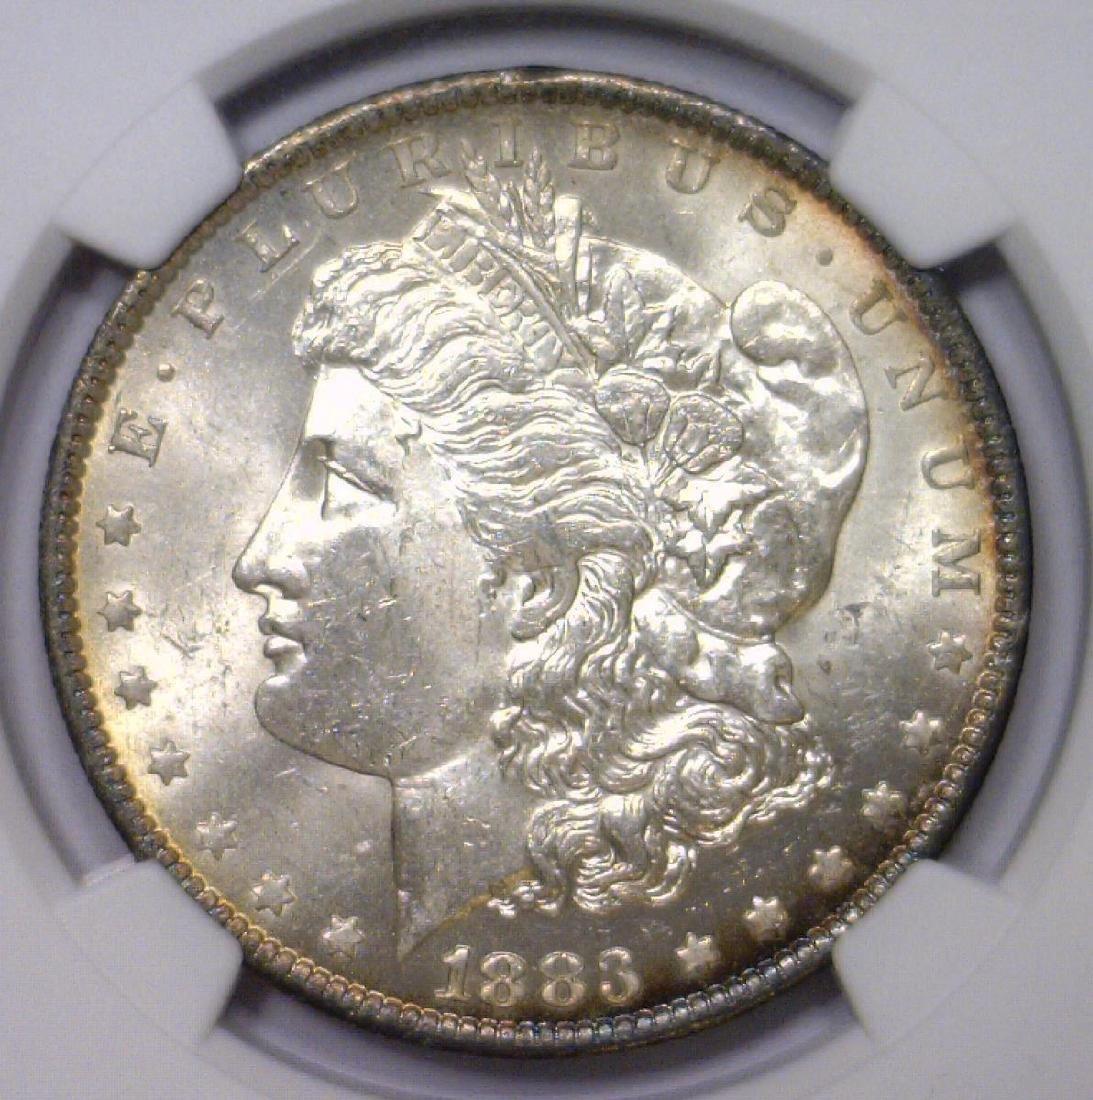 1883-O Morgan Silver Dollar NGC UNC det. obv clnd